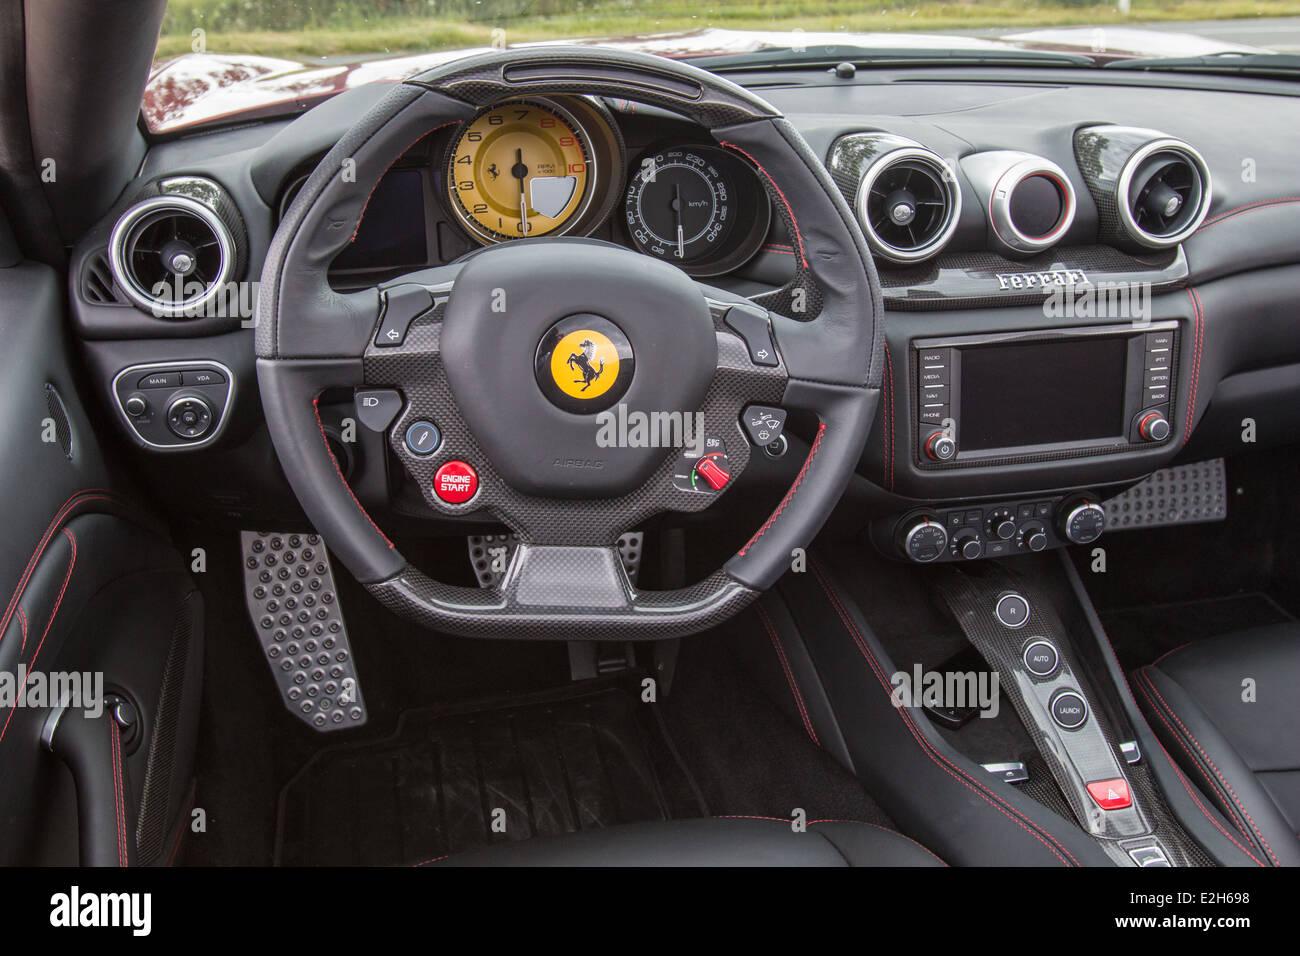 Ferrari California T In Northern Italy Stock Photo 70448932 Alamy